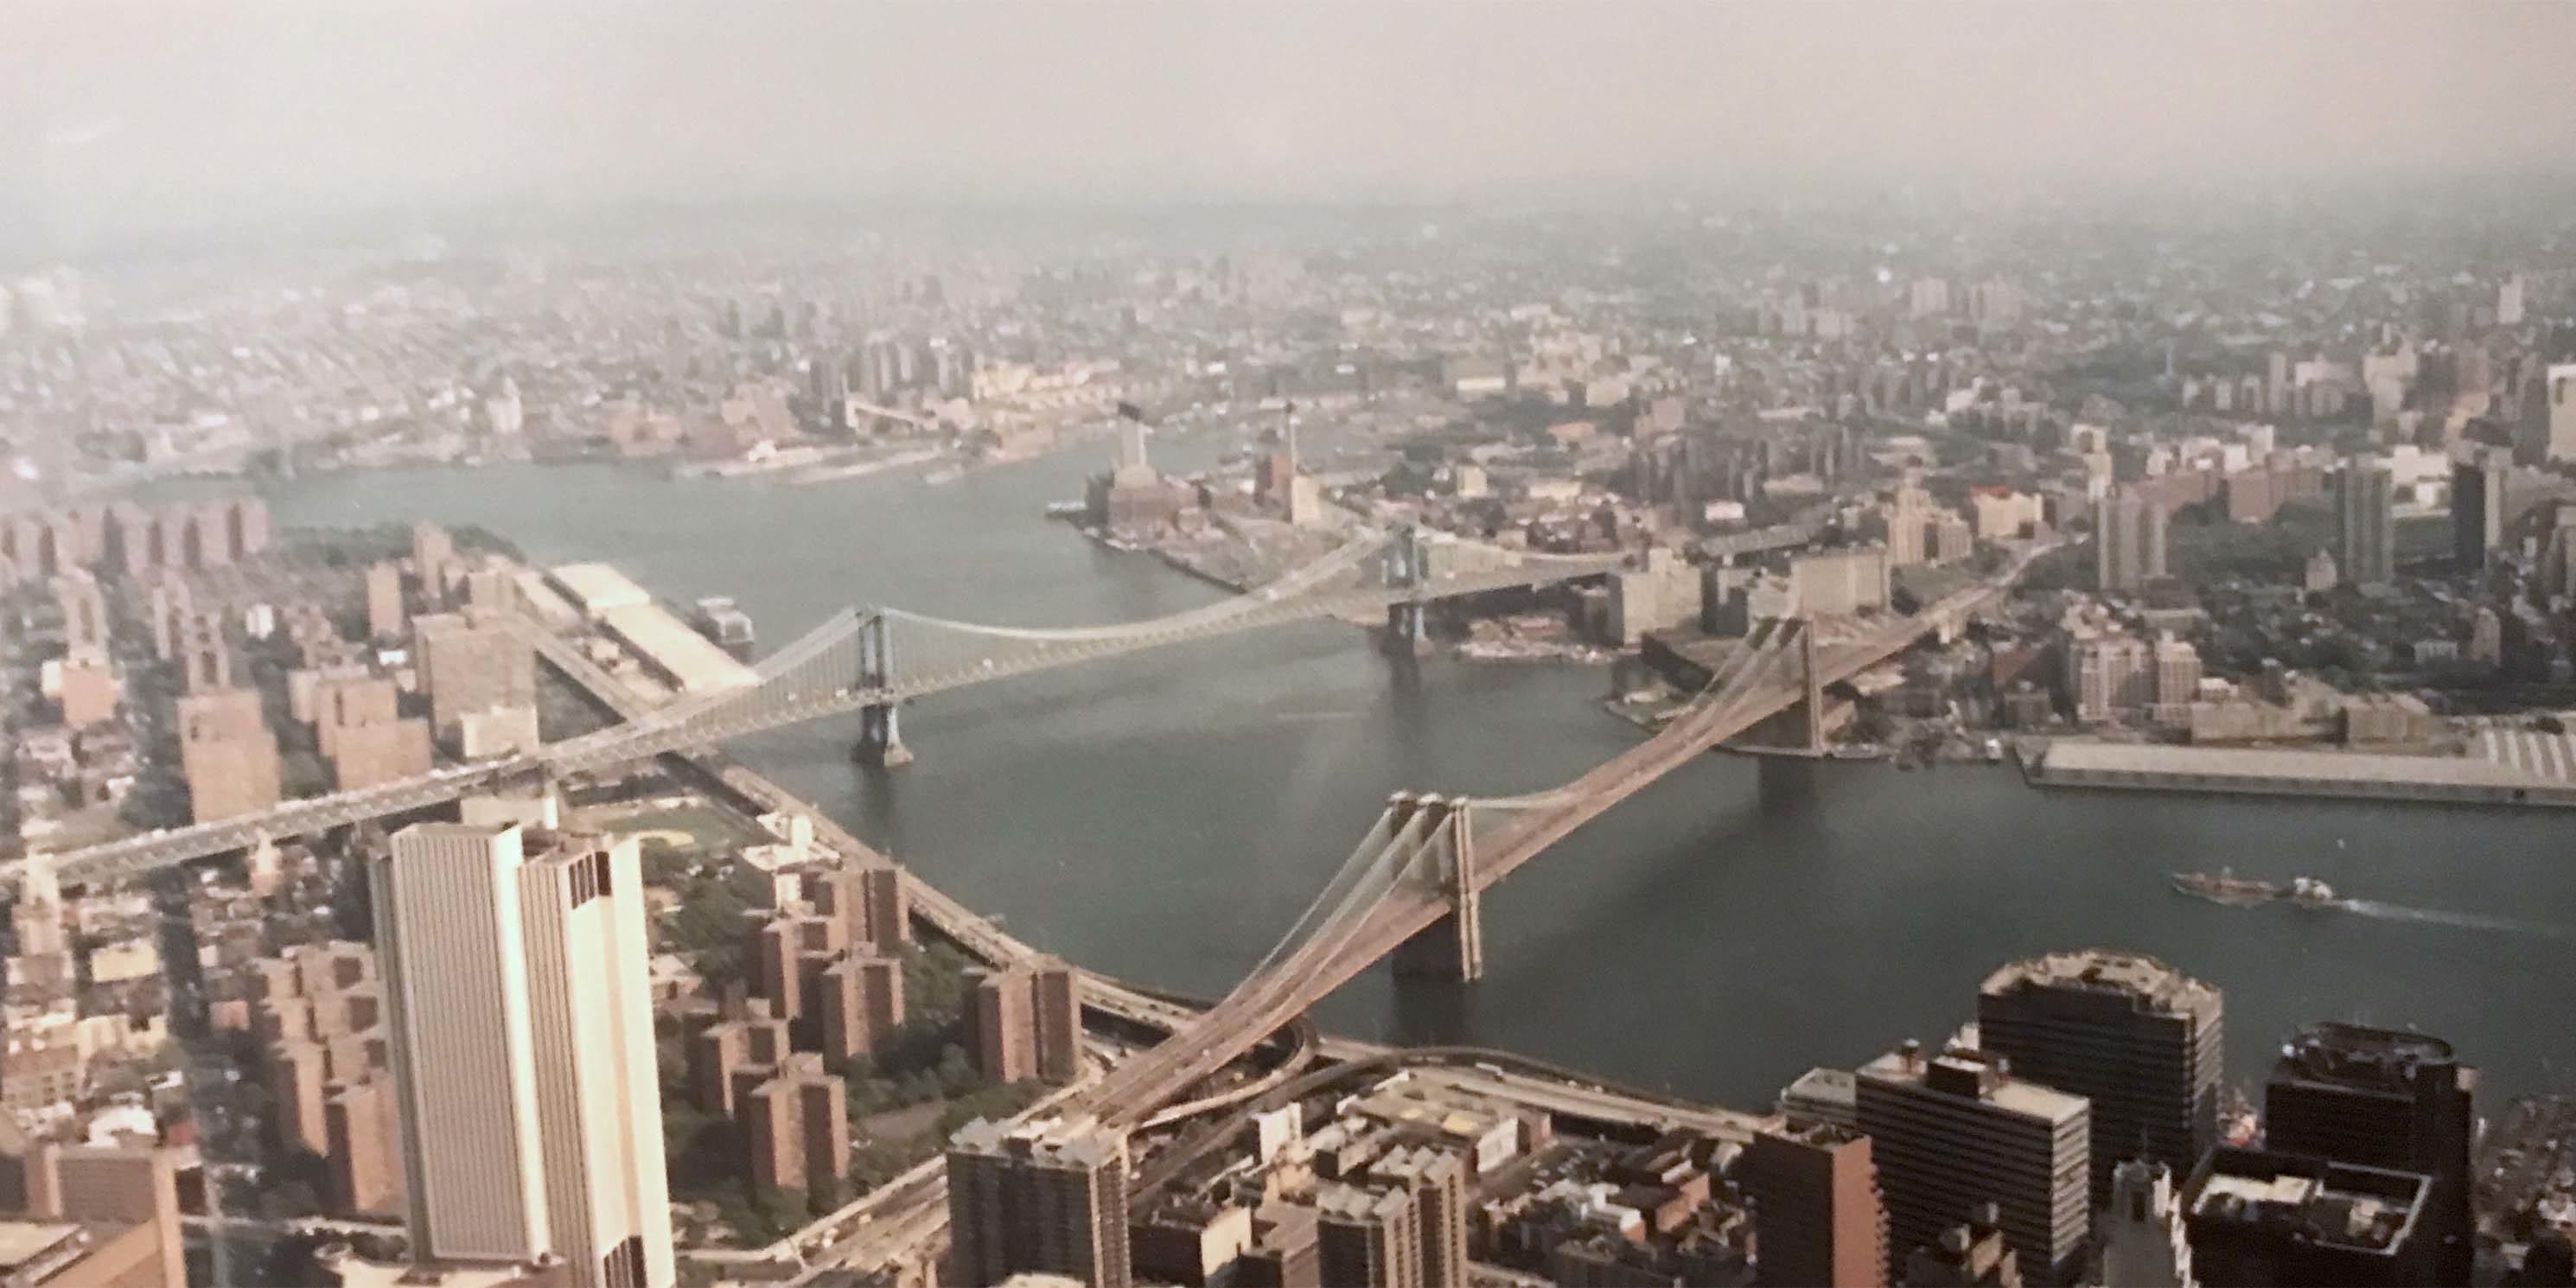 Brooklyn and Manhattan Bridges as seen from above